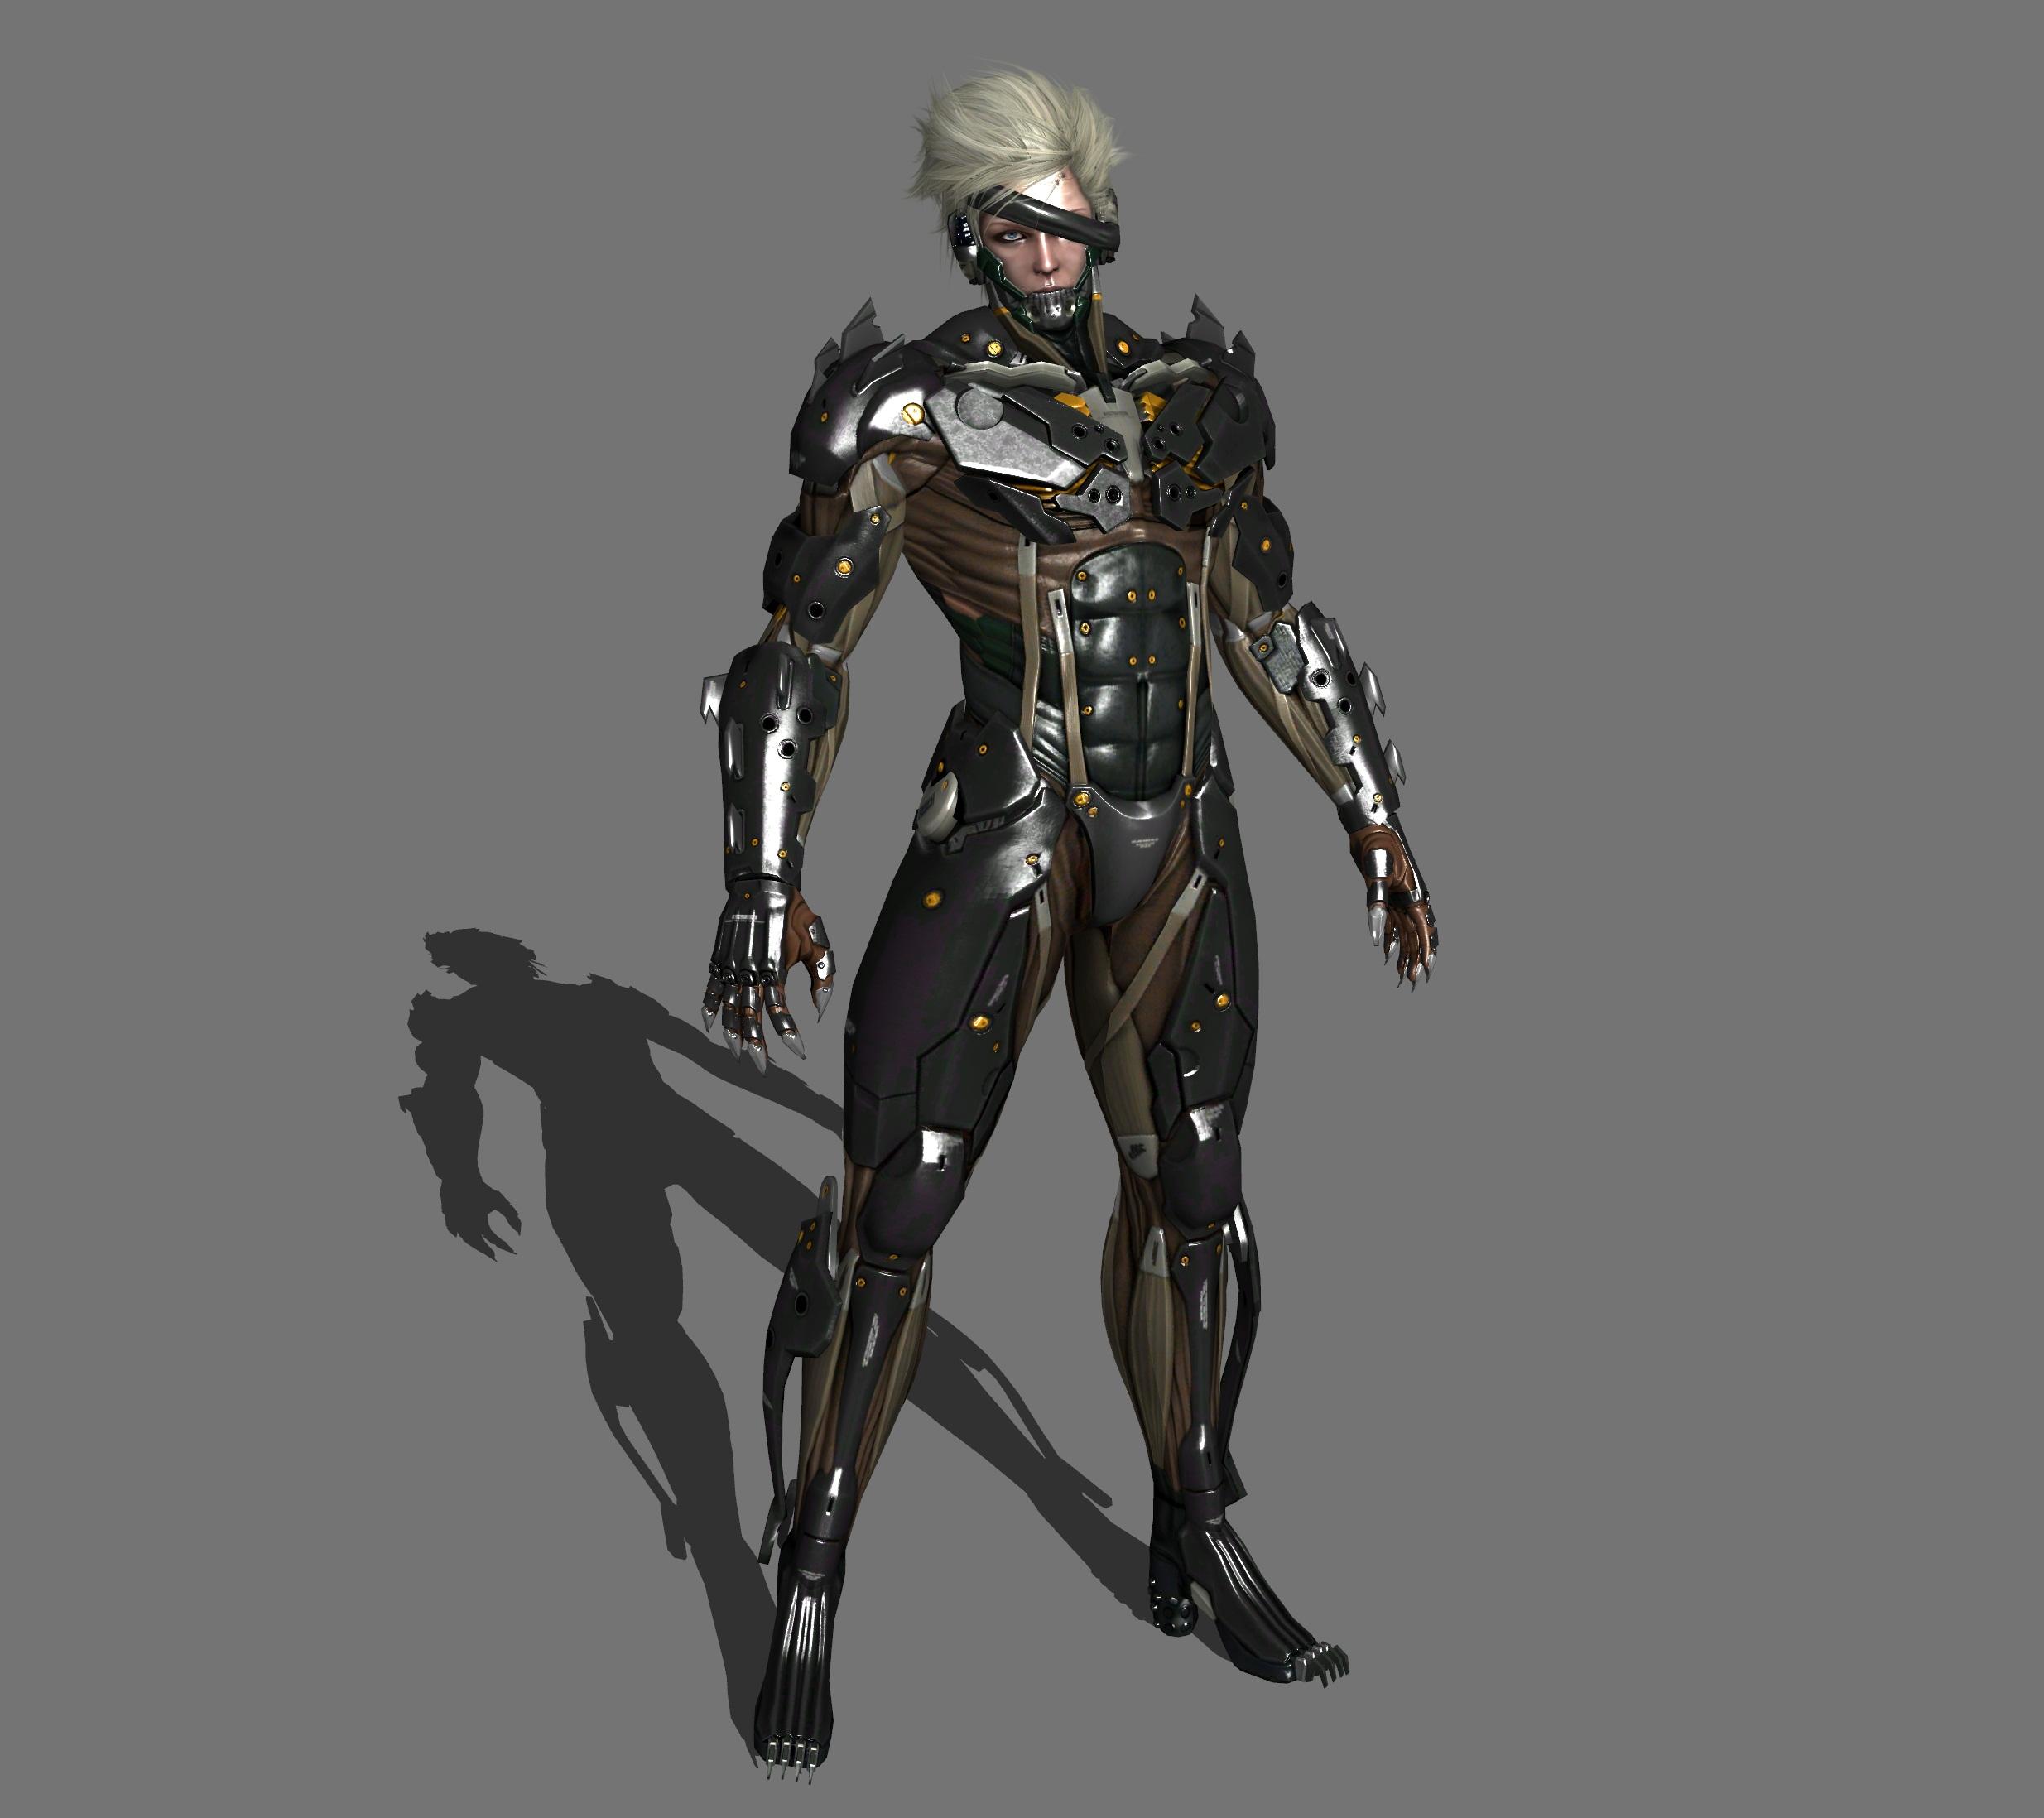 Metal Gear para Resident Evil 6 Metal_gear_rising___revengeance___raiden_by_ishikahiruma-d5yknwn